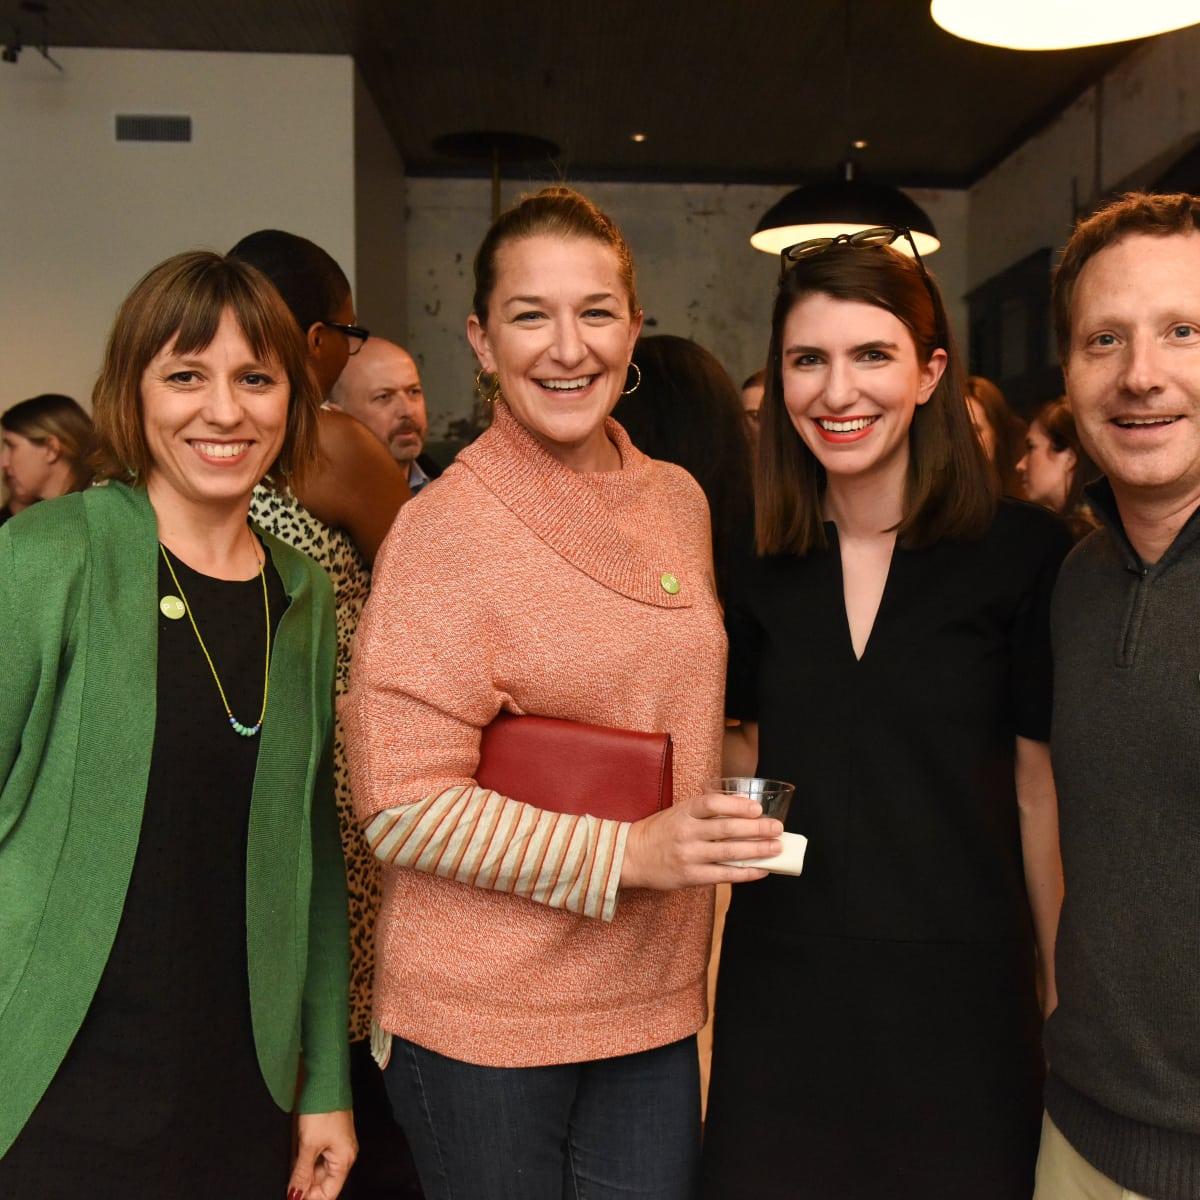 News, Pier & Beam party, Dec. 2015, Marisa Janusz, Rene Zamore, Elizabeth Marrin, Brett Zamore.